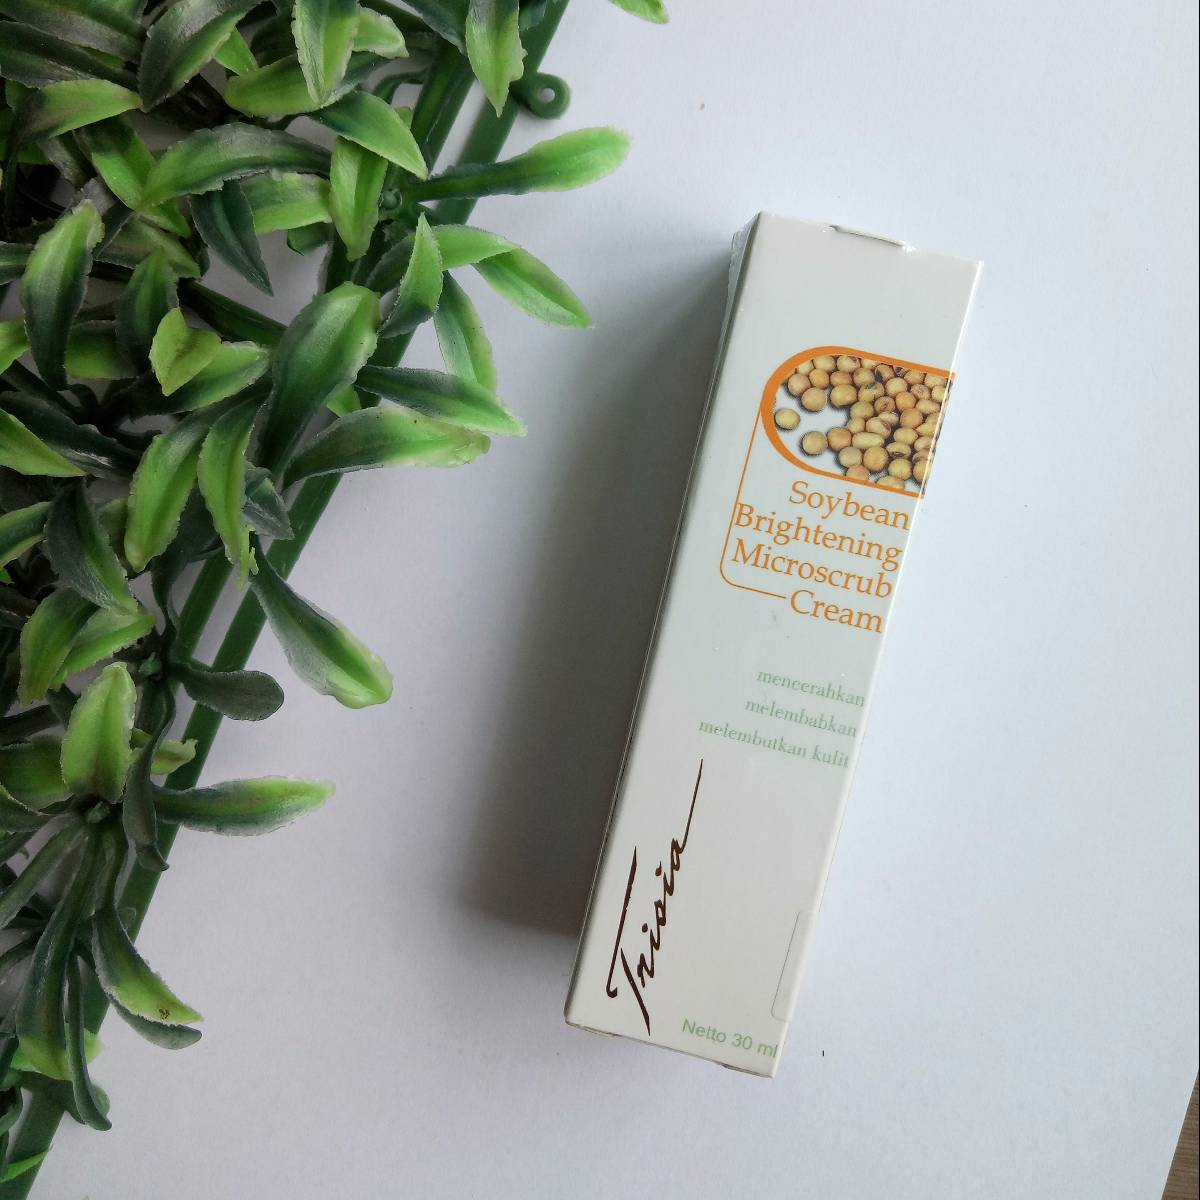 Trisia Soybean Brightening Whitening Microscrub Cream Pemutih Wajah